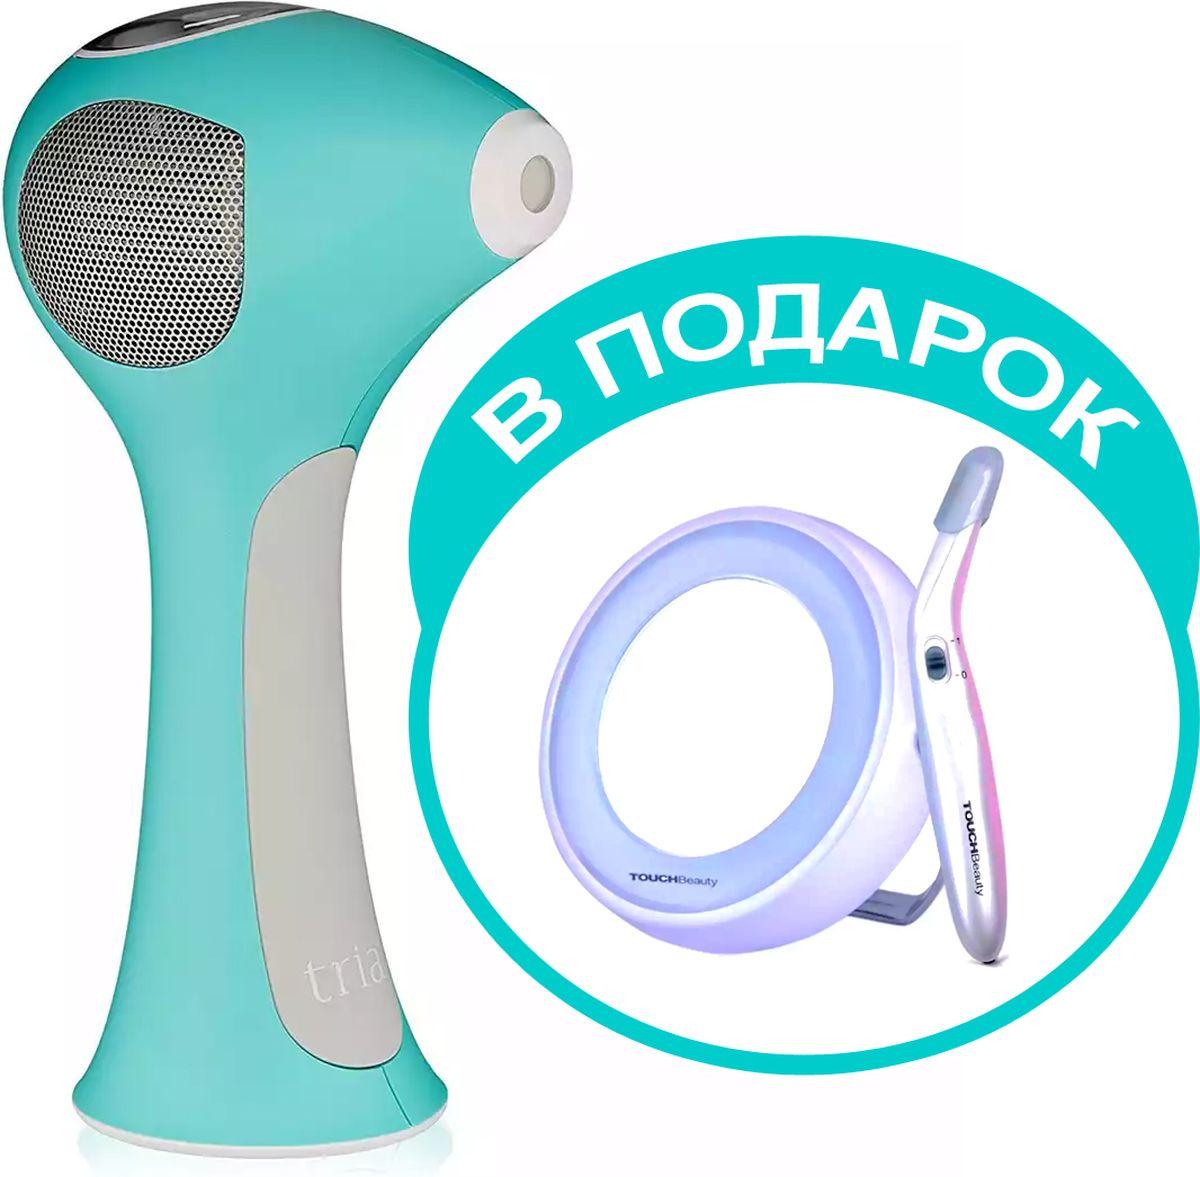 TRIA Лазерный эпилятор Hair Removal Laser4X Turquoise + ПОДАРОК! Косметический набор TOUCHBEAUTY AS-1001